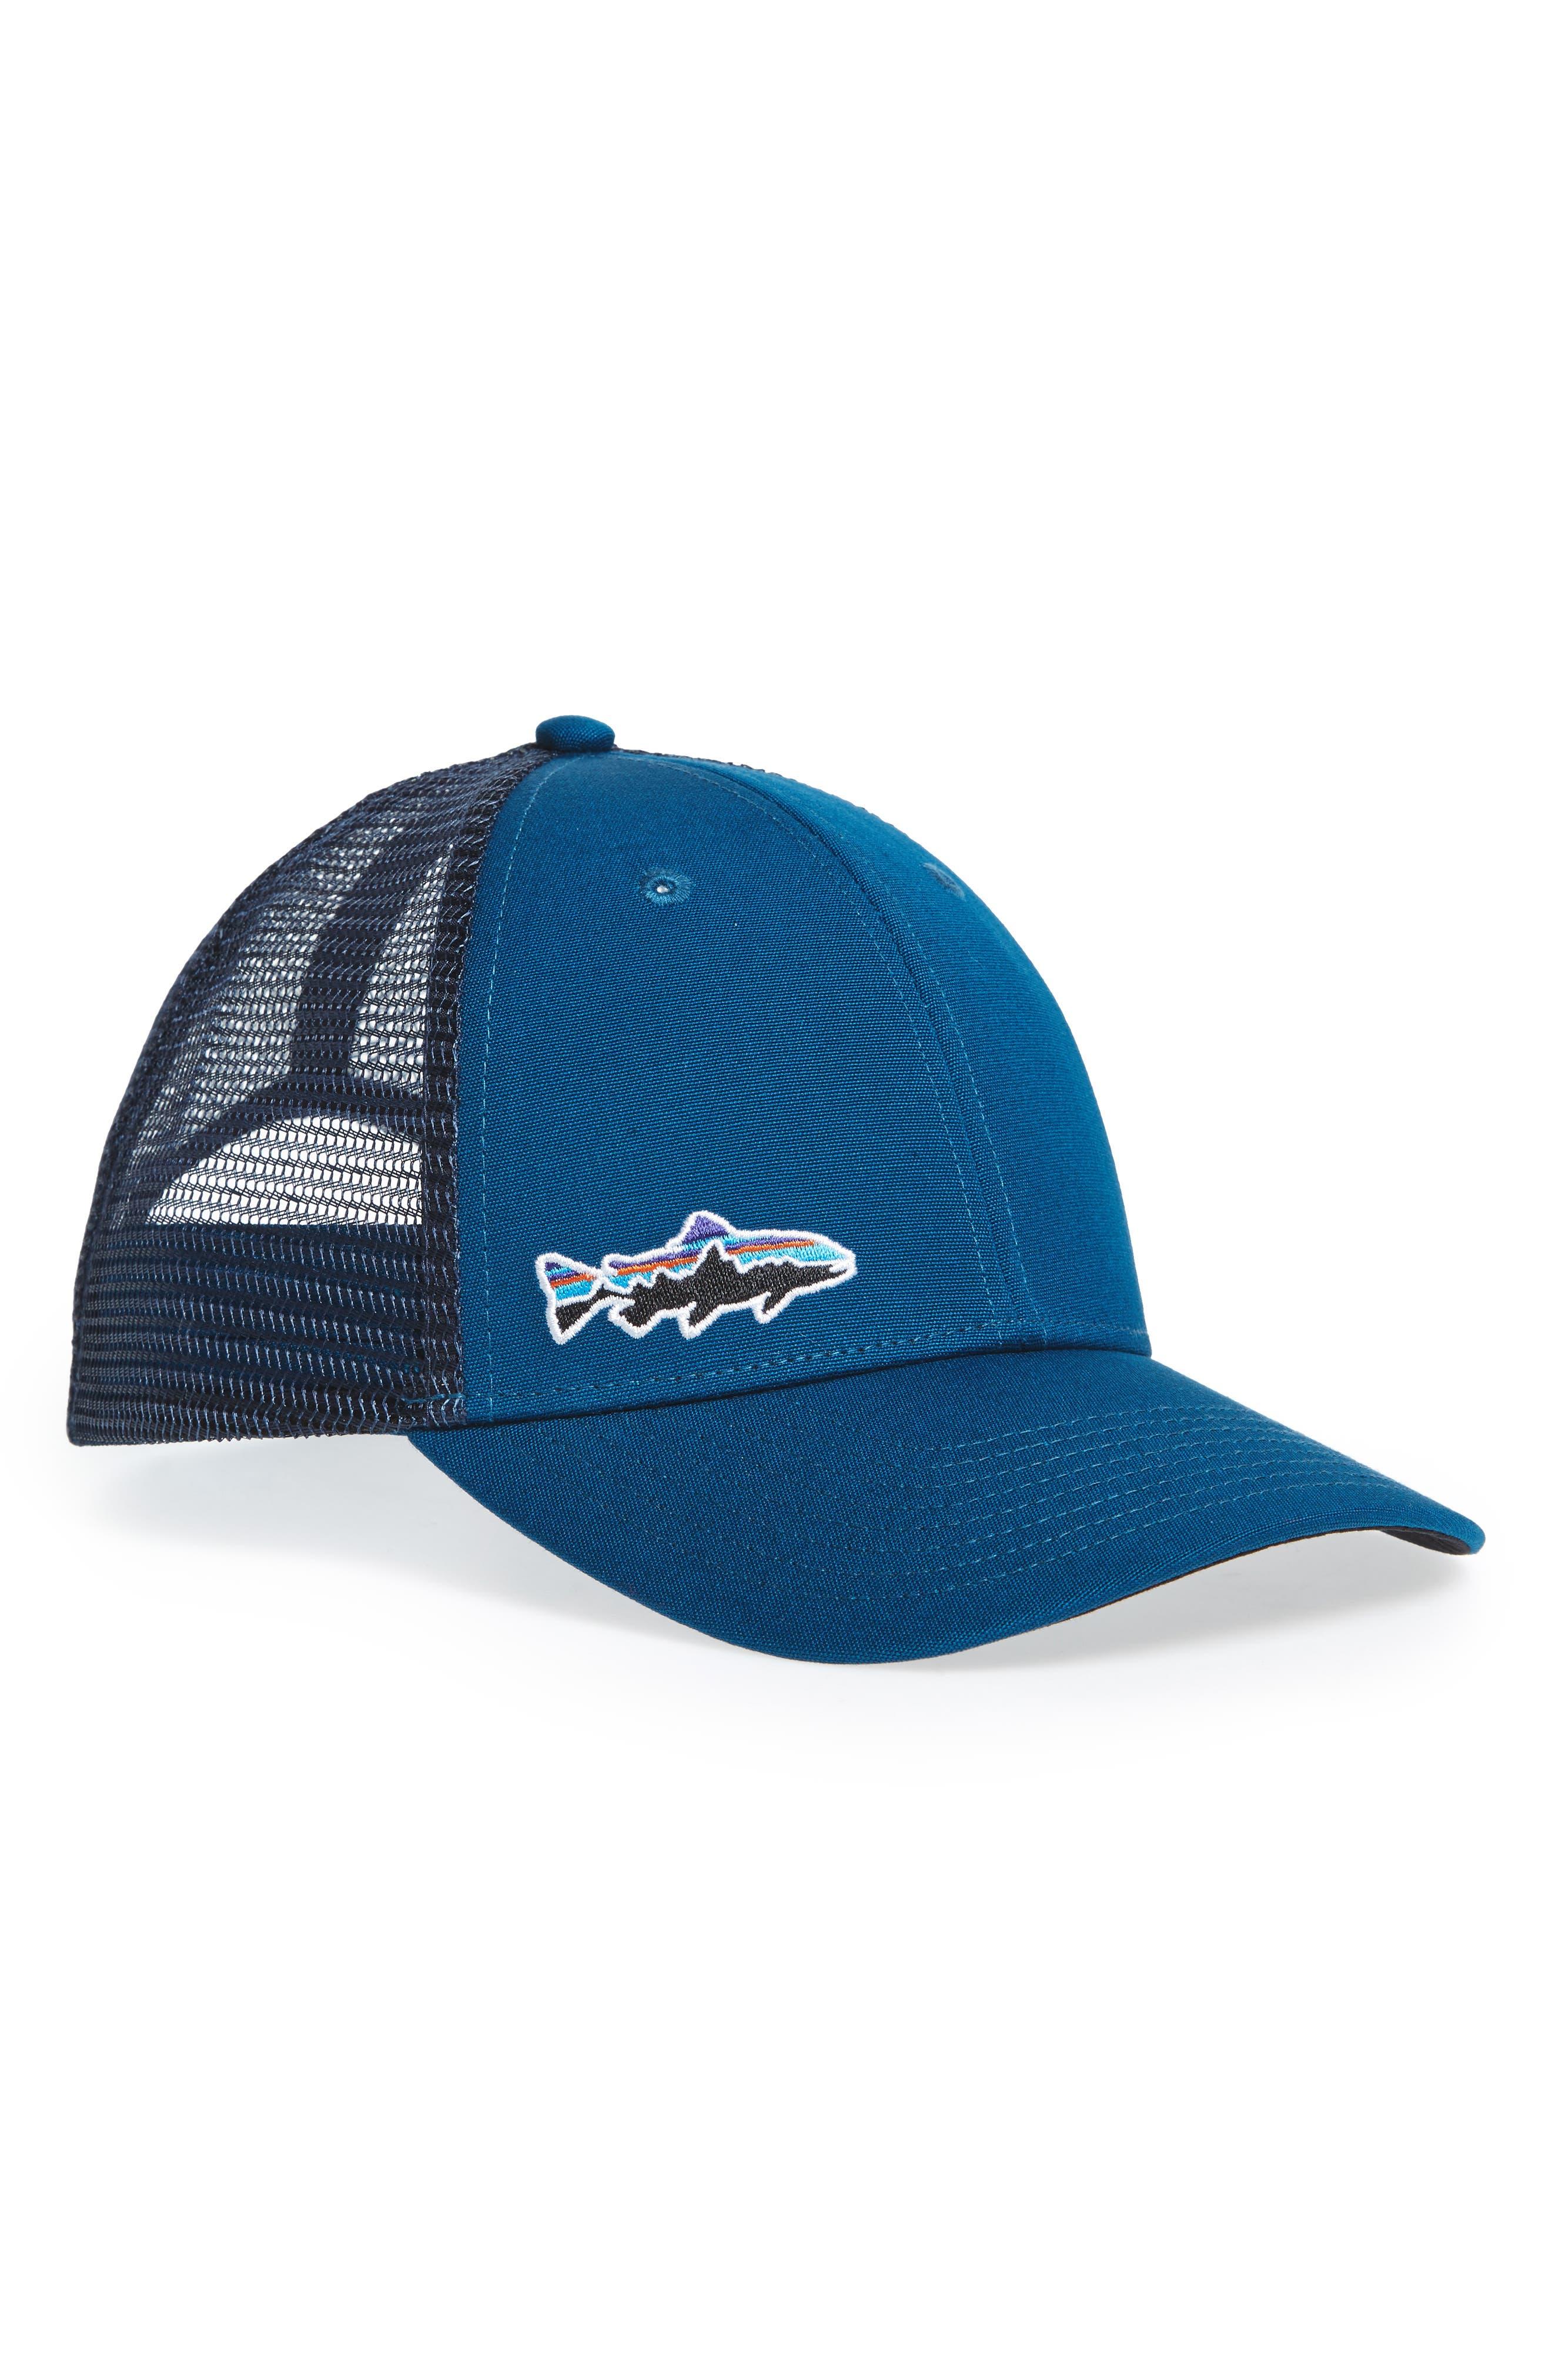 Patagonia 'Fitz Roy' Trucker Hat